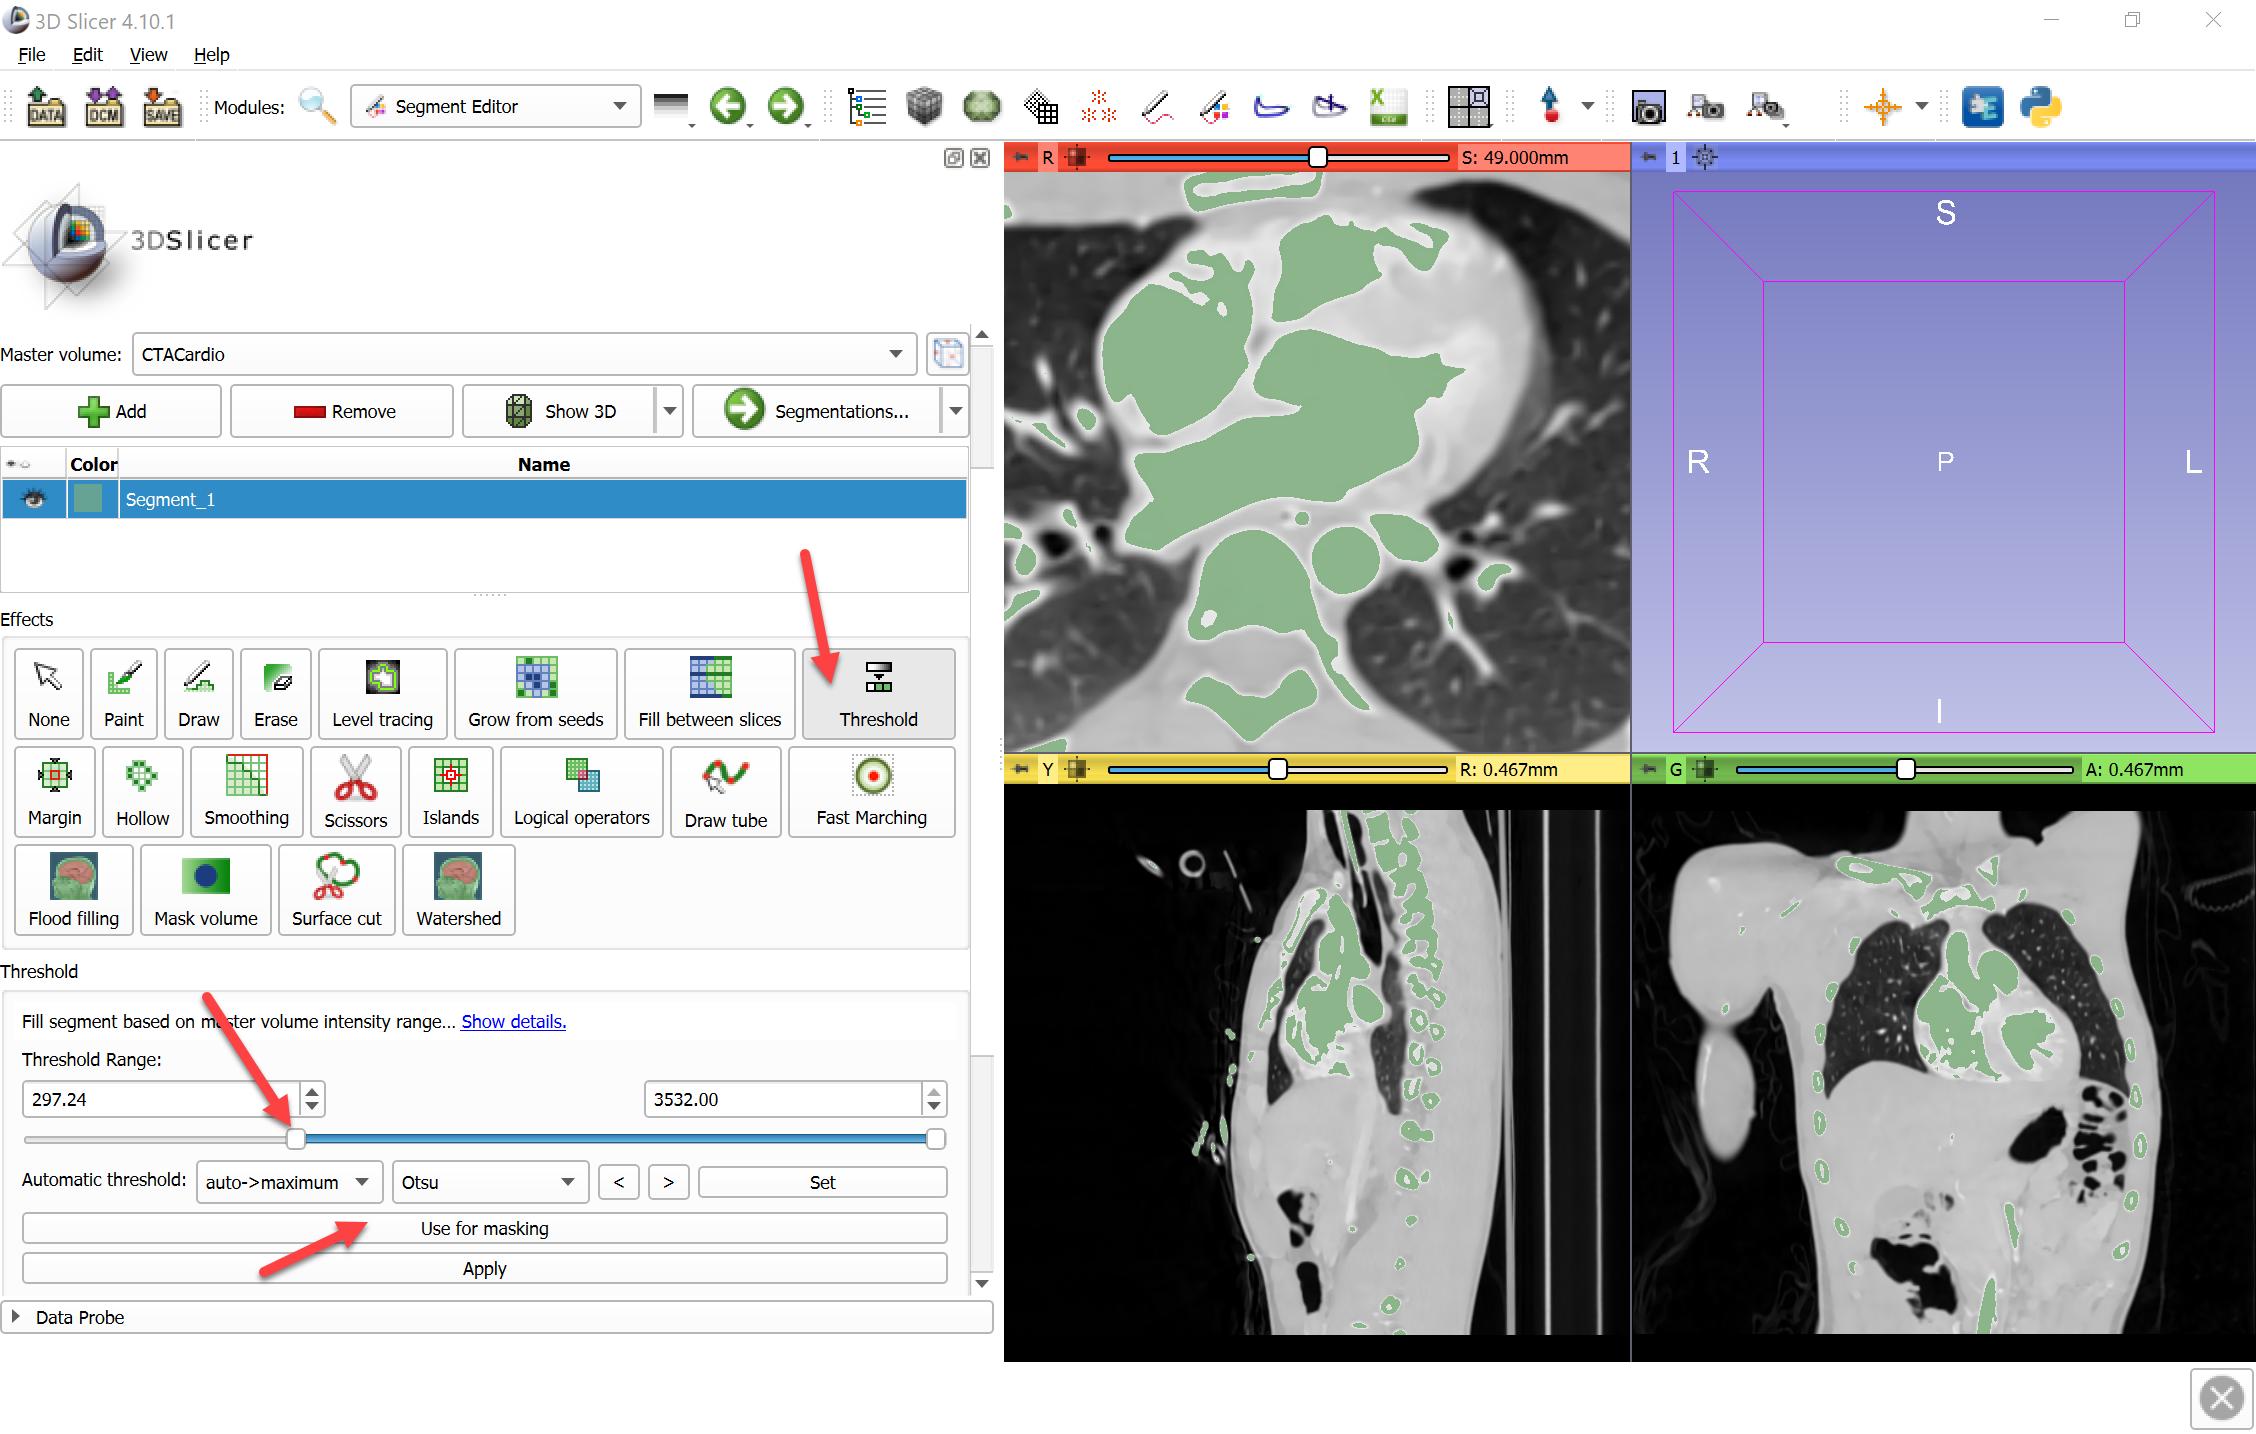 Overview | 3D Slicer segmentation recipes